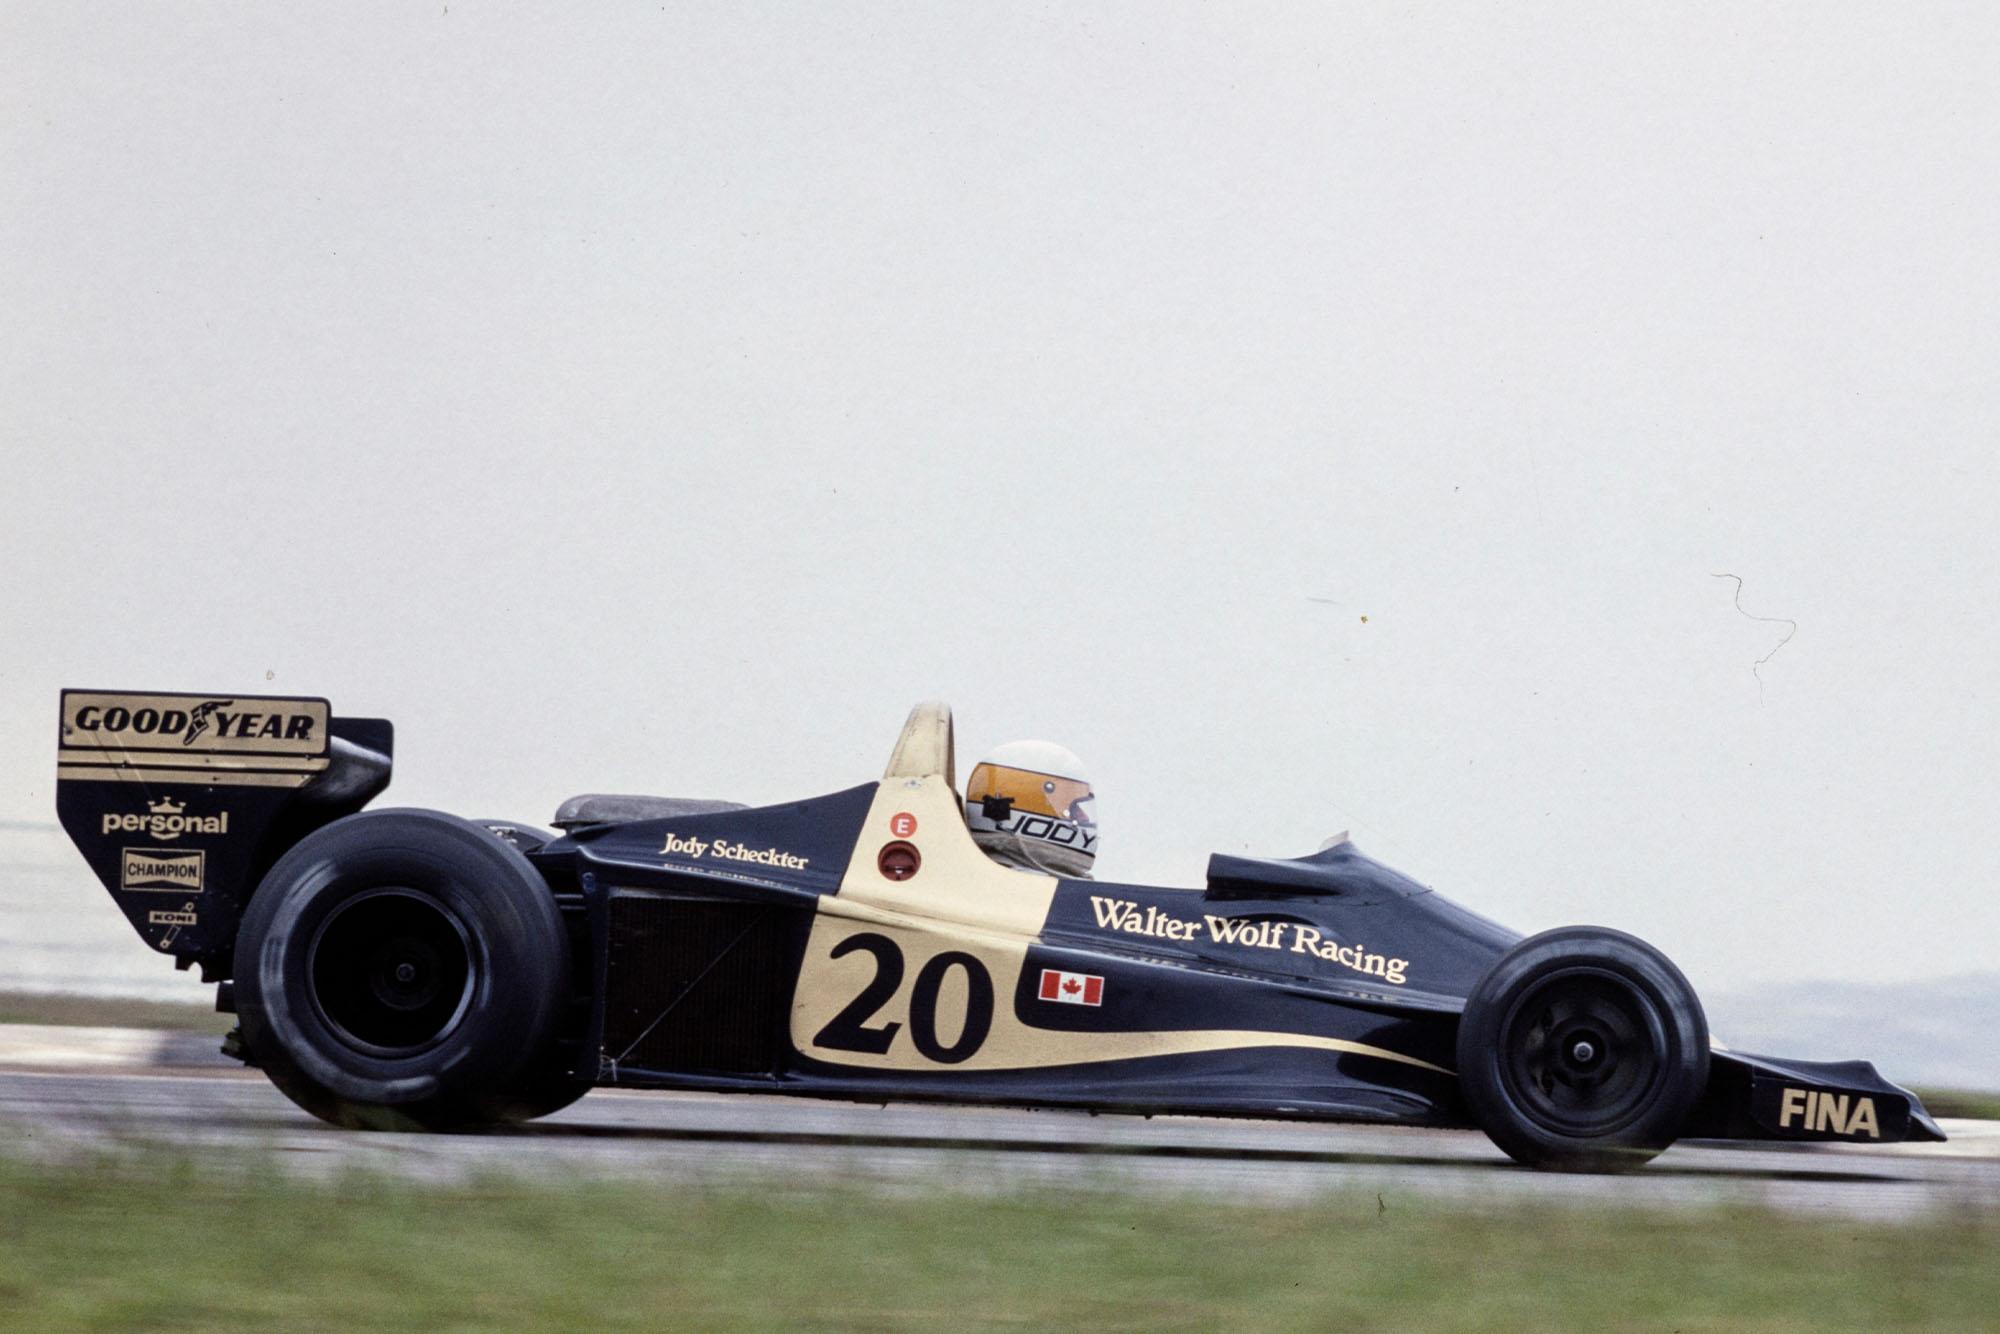 Jody Scheckter (Wolf) at the 1977 Brazilian Grand Prix, Interlagos.